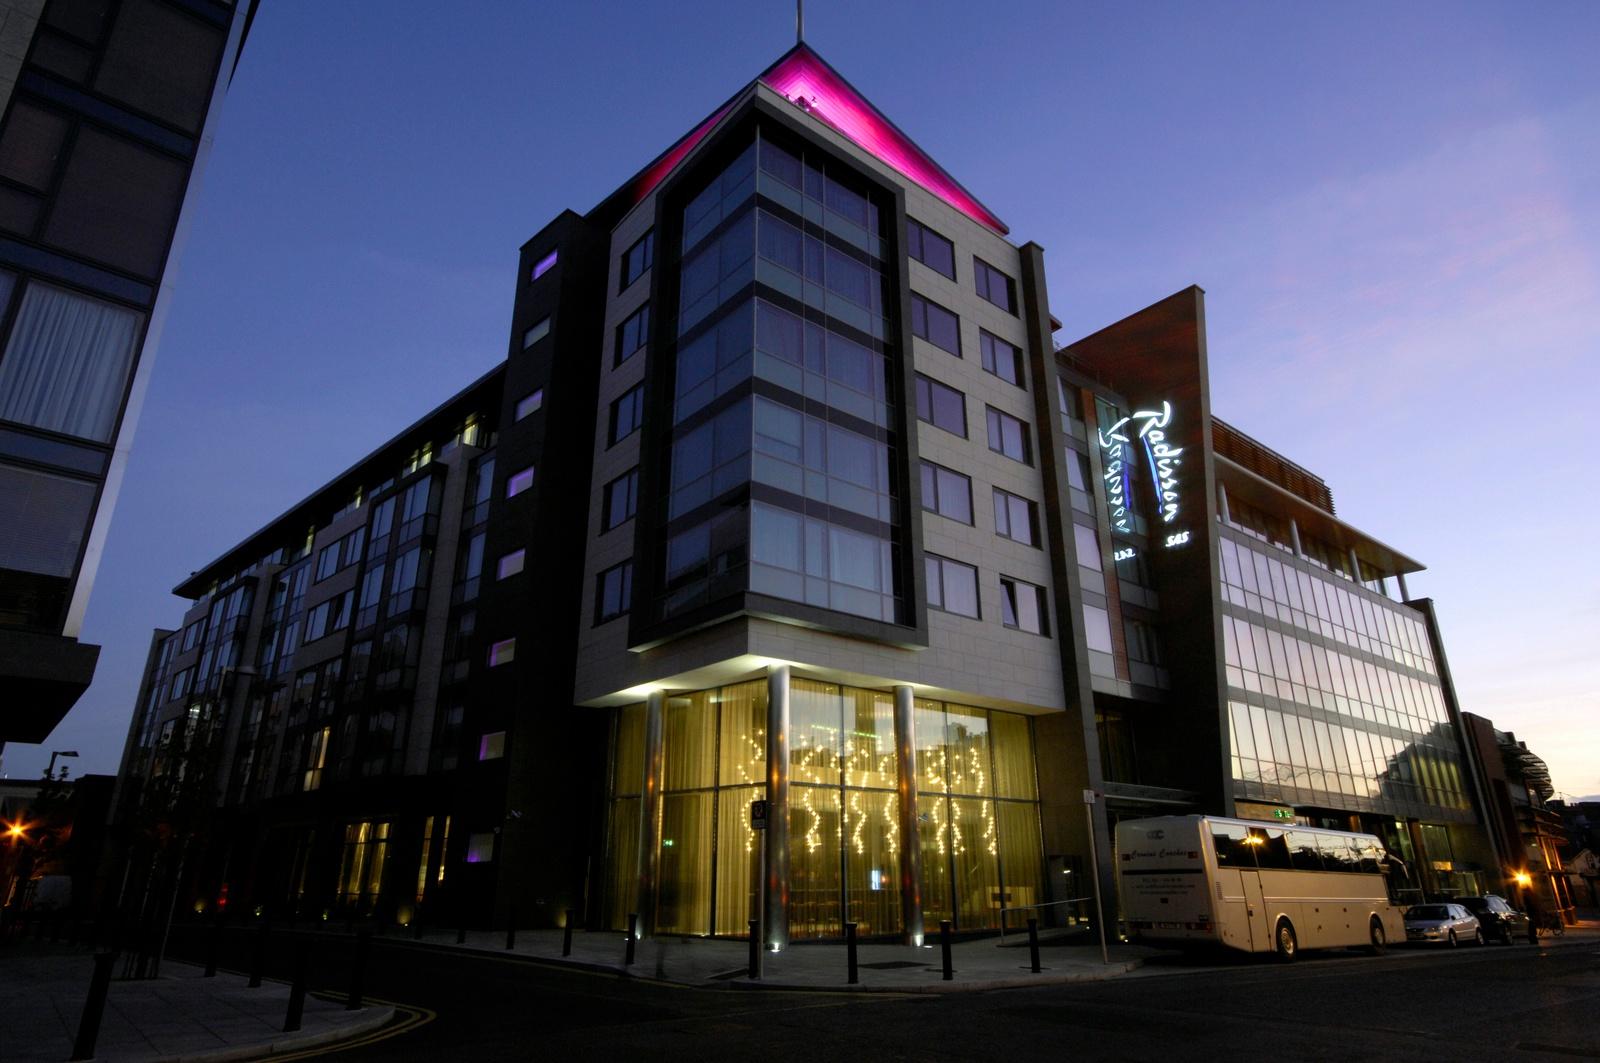 Radisson SAS hotel Dublin; colour changing uplighting to VIP bar balcony